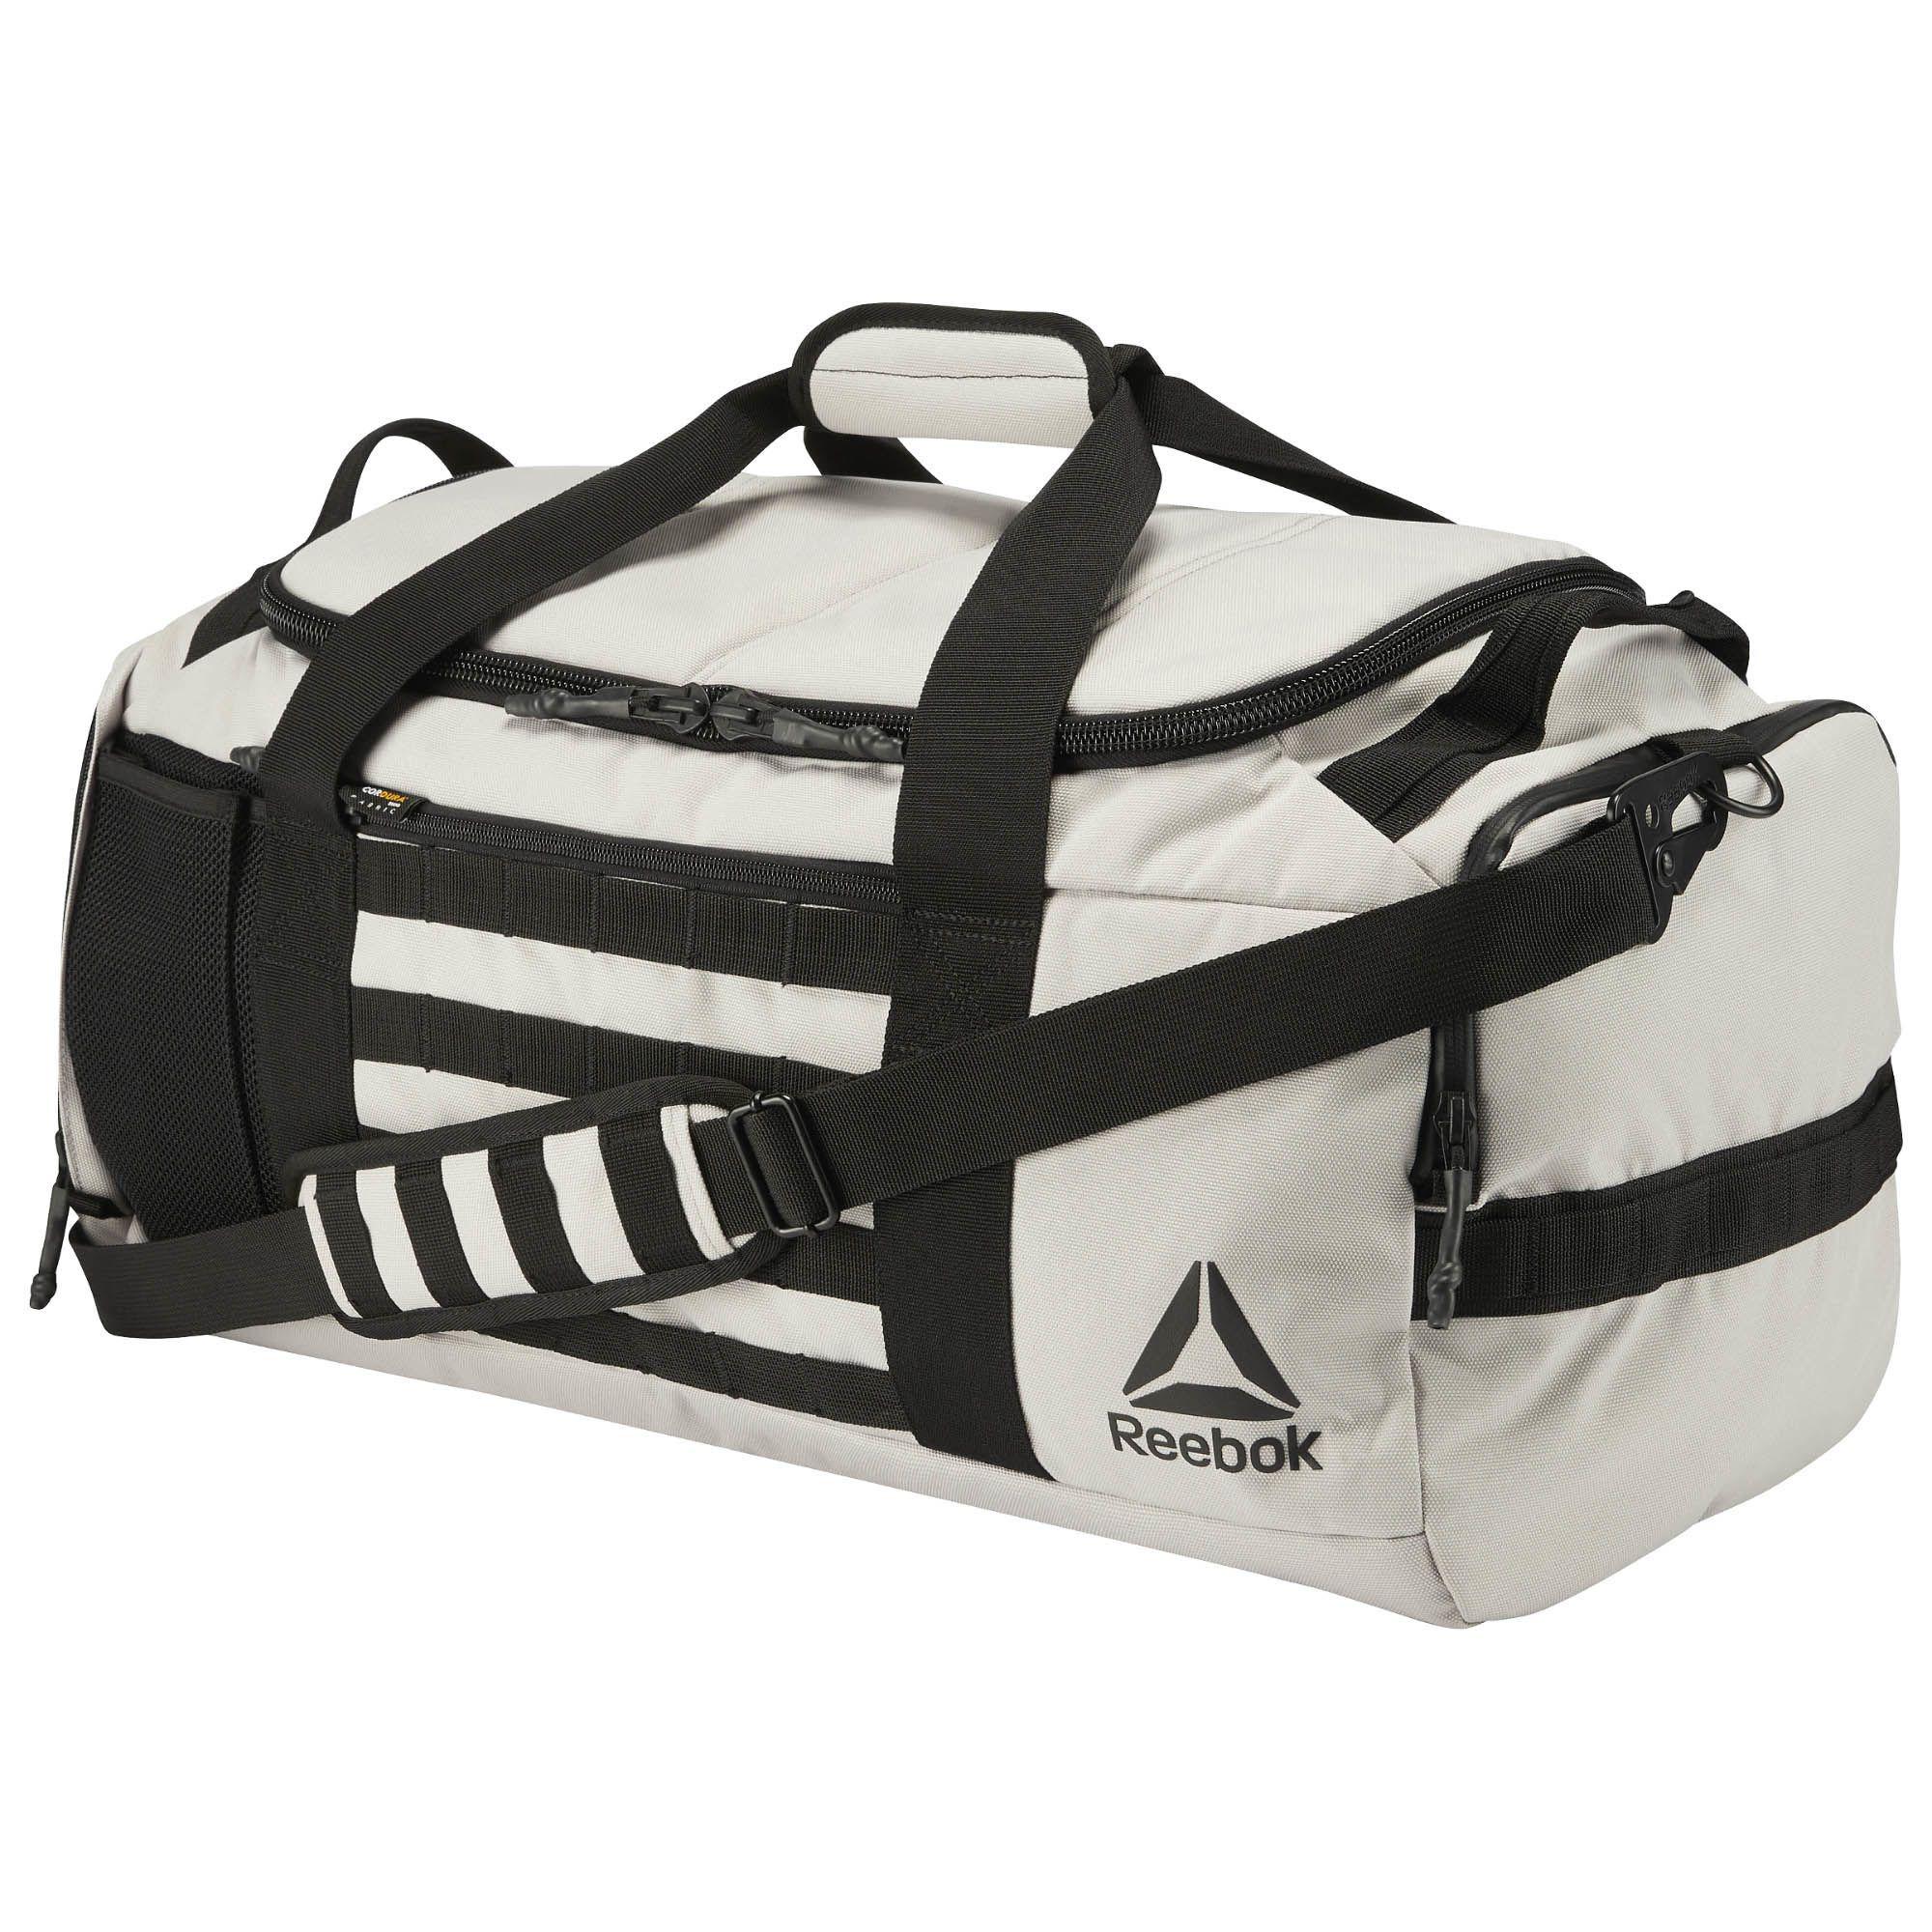 010c981d Reebok - Reebok Grip Duffle Bag | Gym bags | Gym bag, Bags, Yoga bag